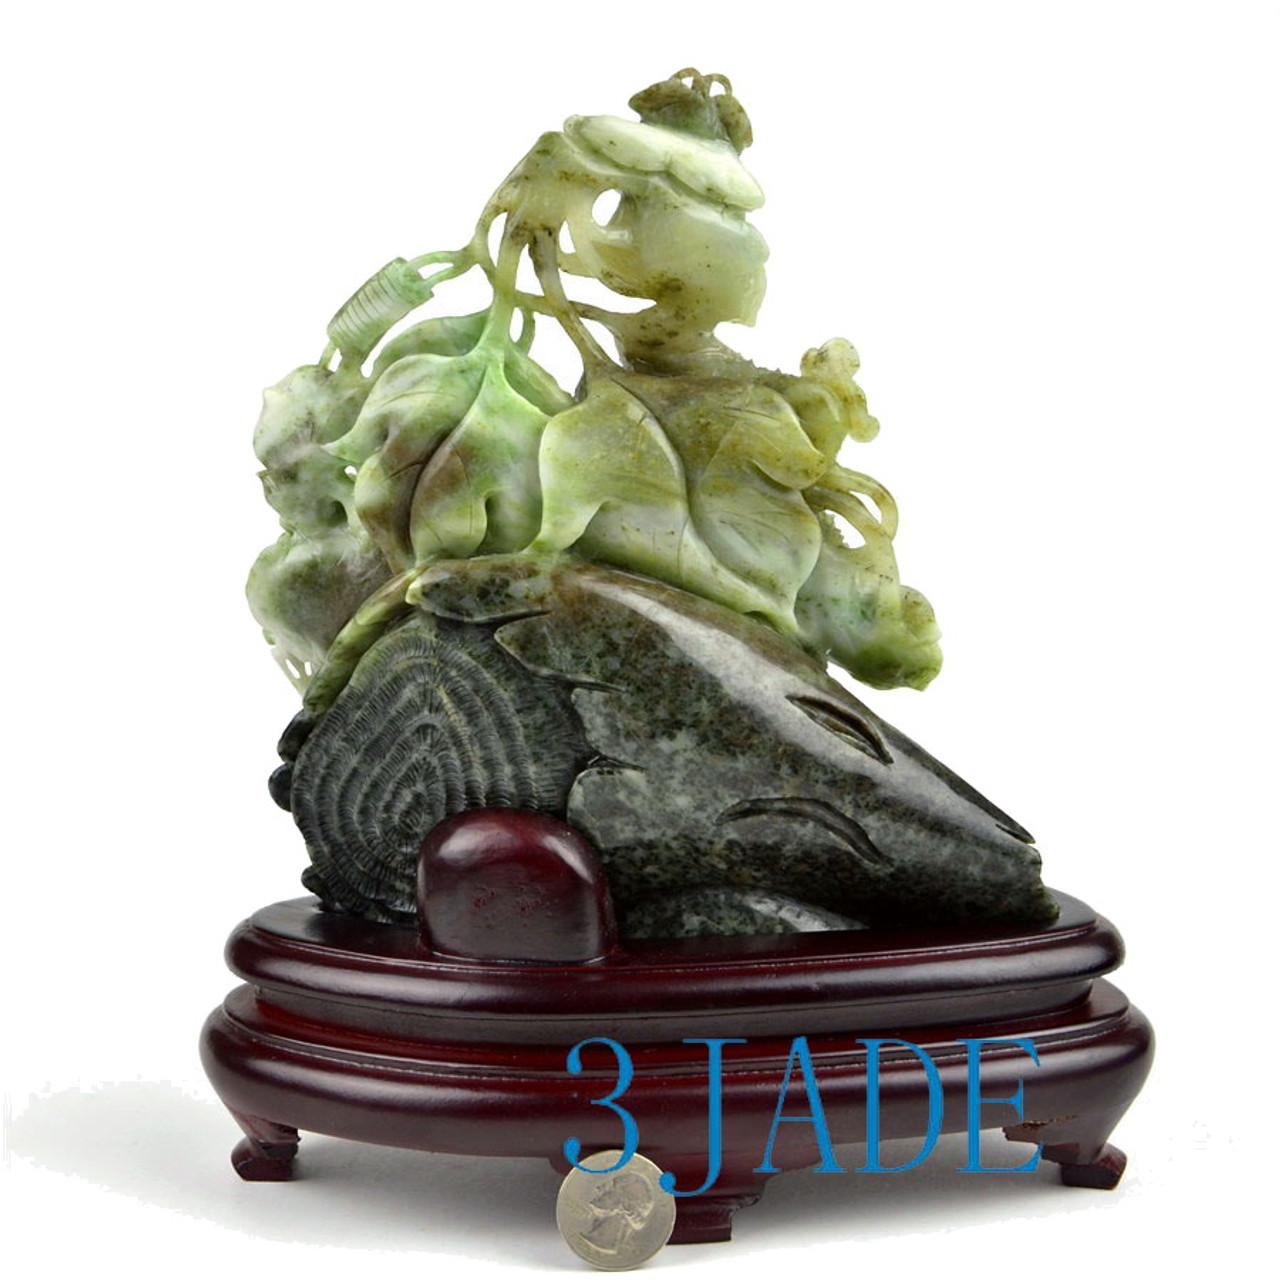 Natural Dushan Jade Plant Statue Sculpture Stone Cucumber Carving